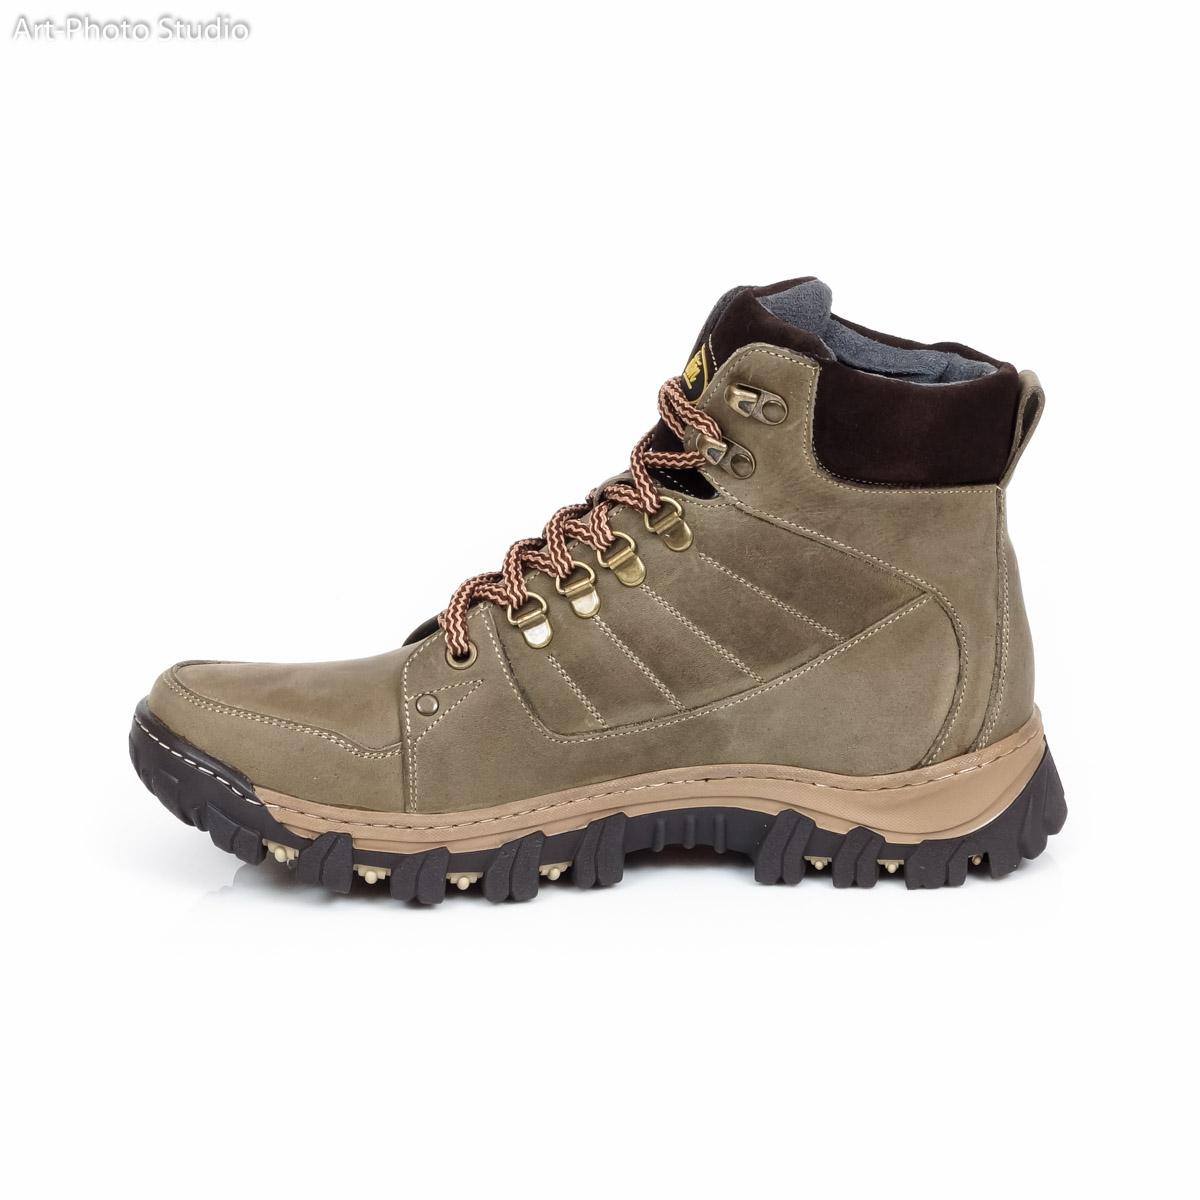 предметная съемка обуви для сайта интернет-магазина LaModa